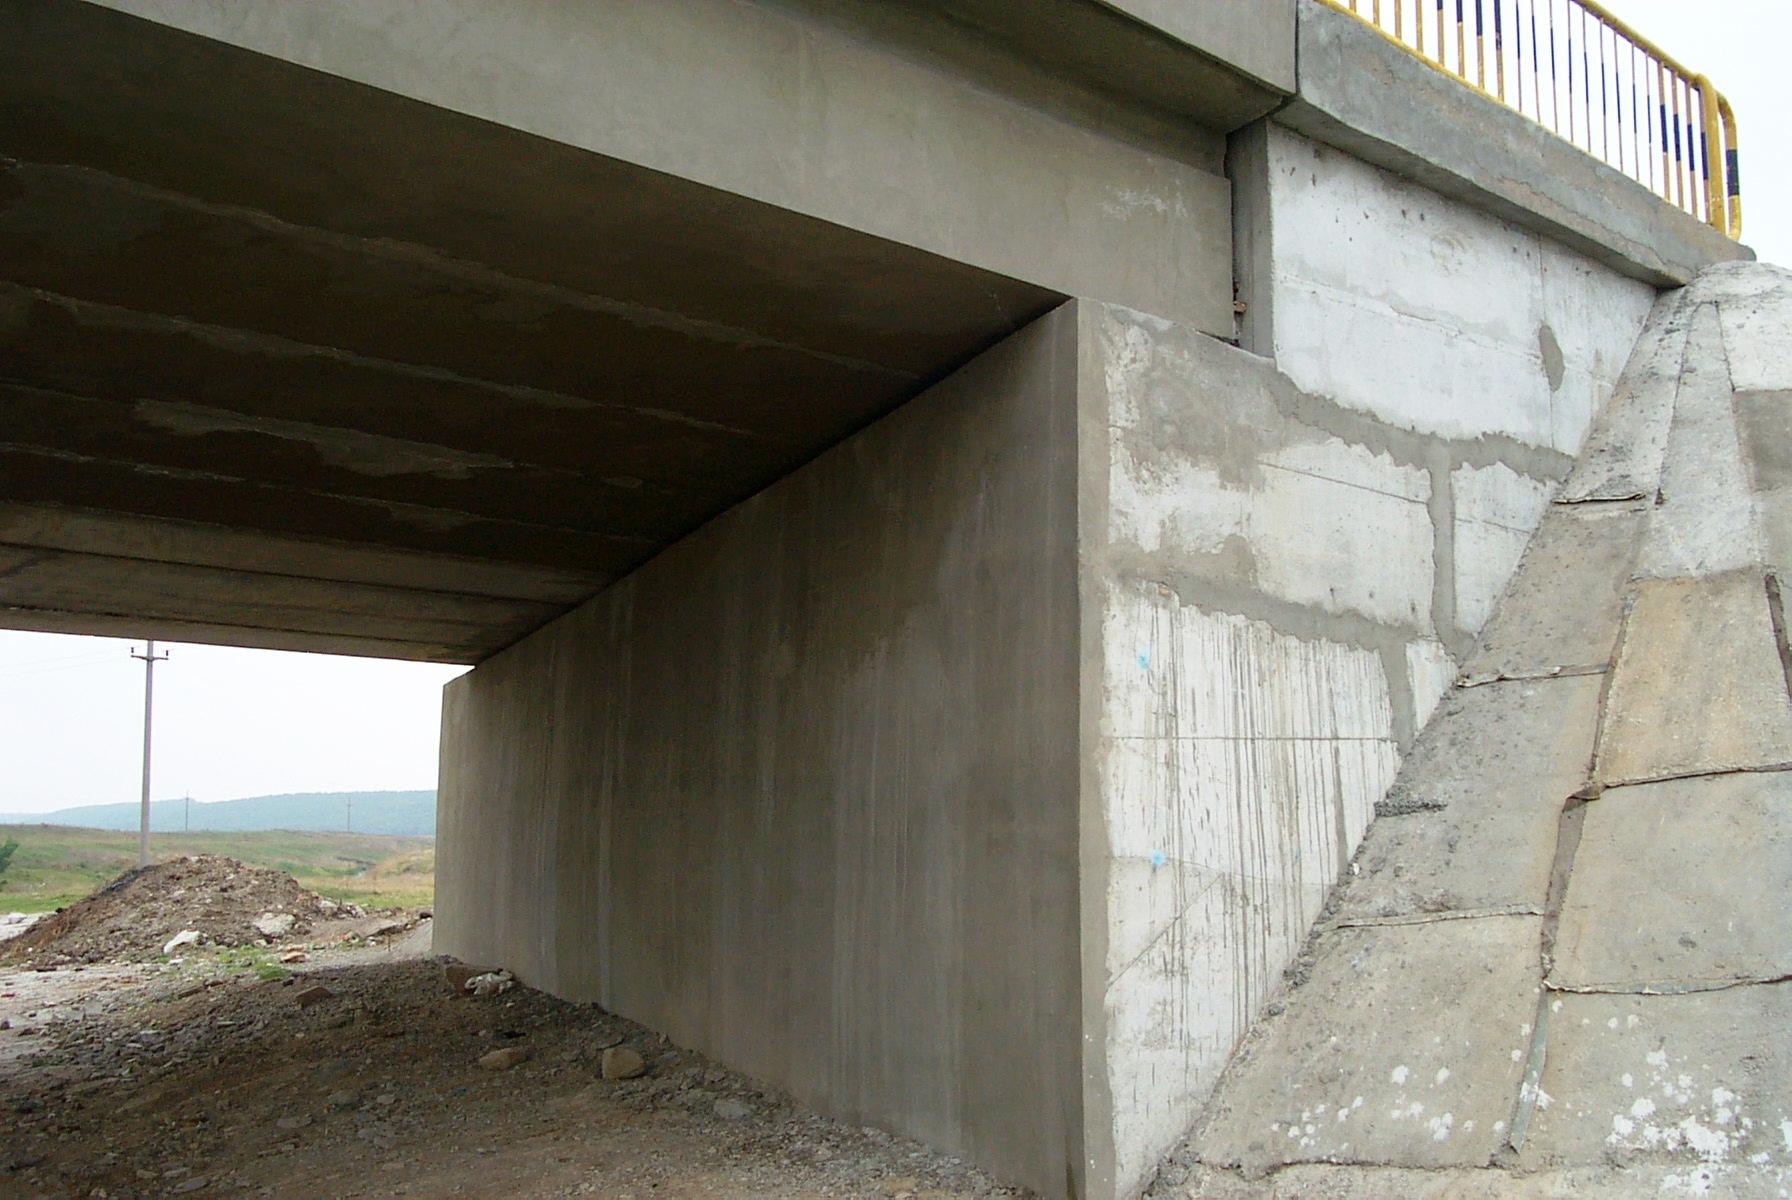 Reparatii pod (DN2), Km. 33 - 028, peste raul Calnistea MAPEI - Poza 13